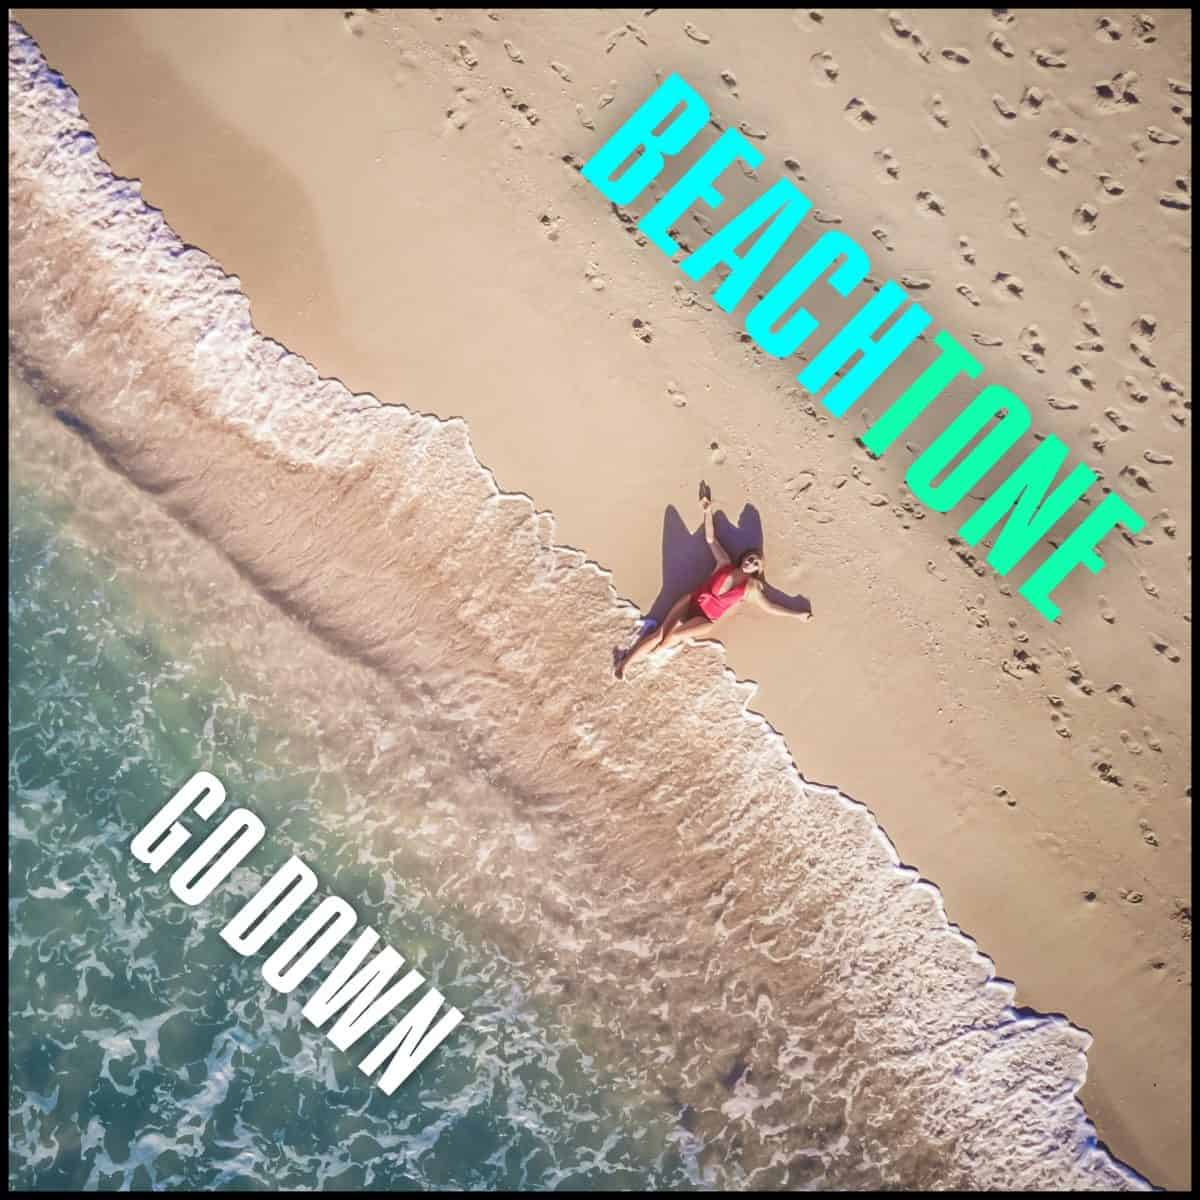 BeachTone - Gow Down